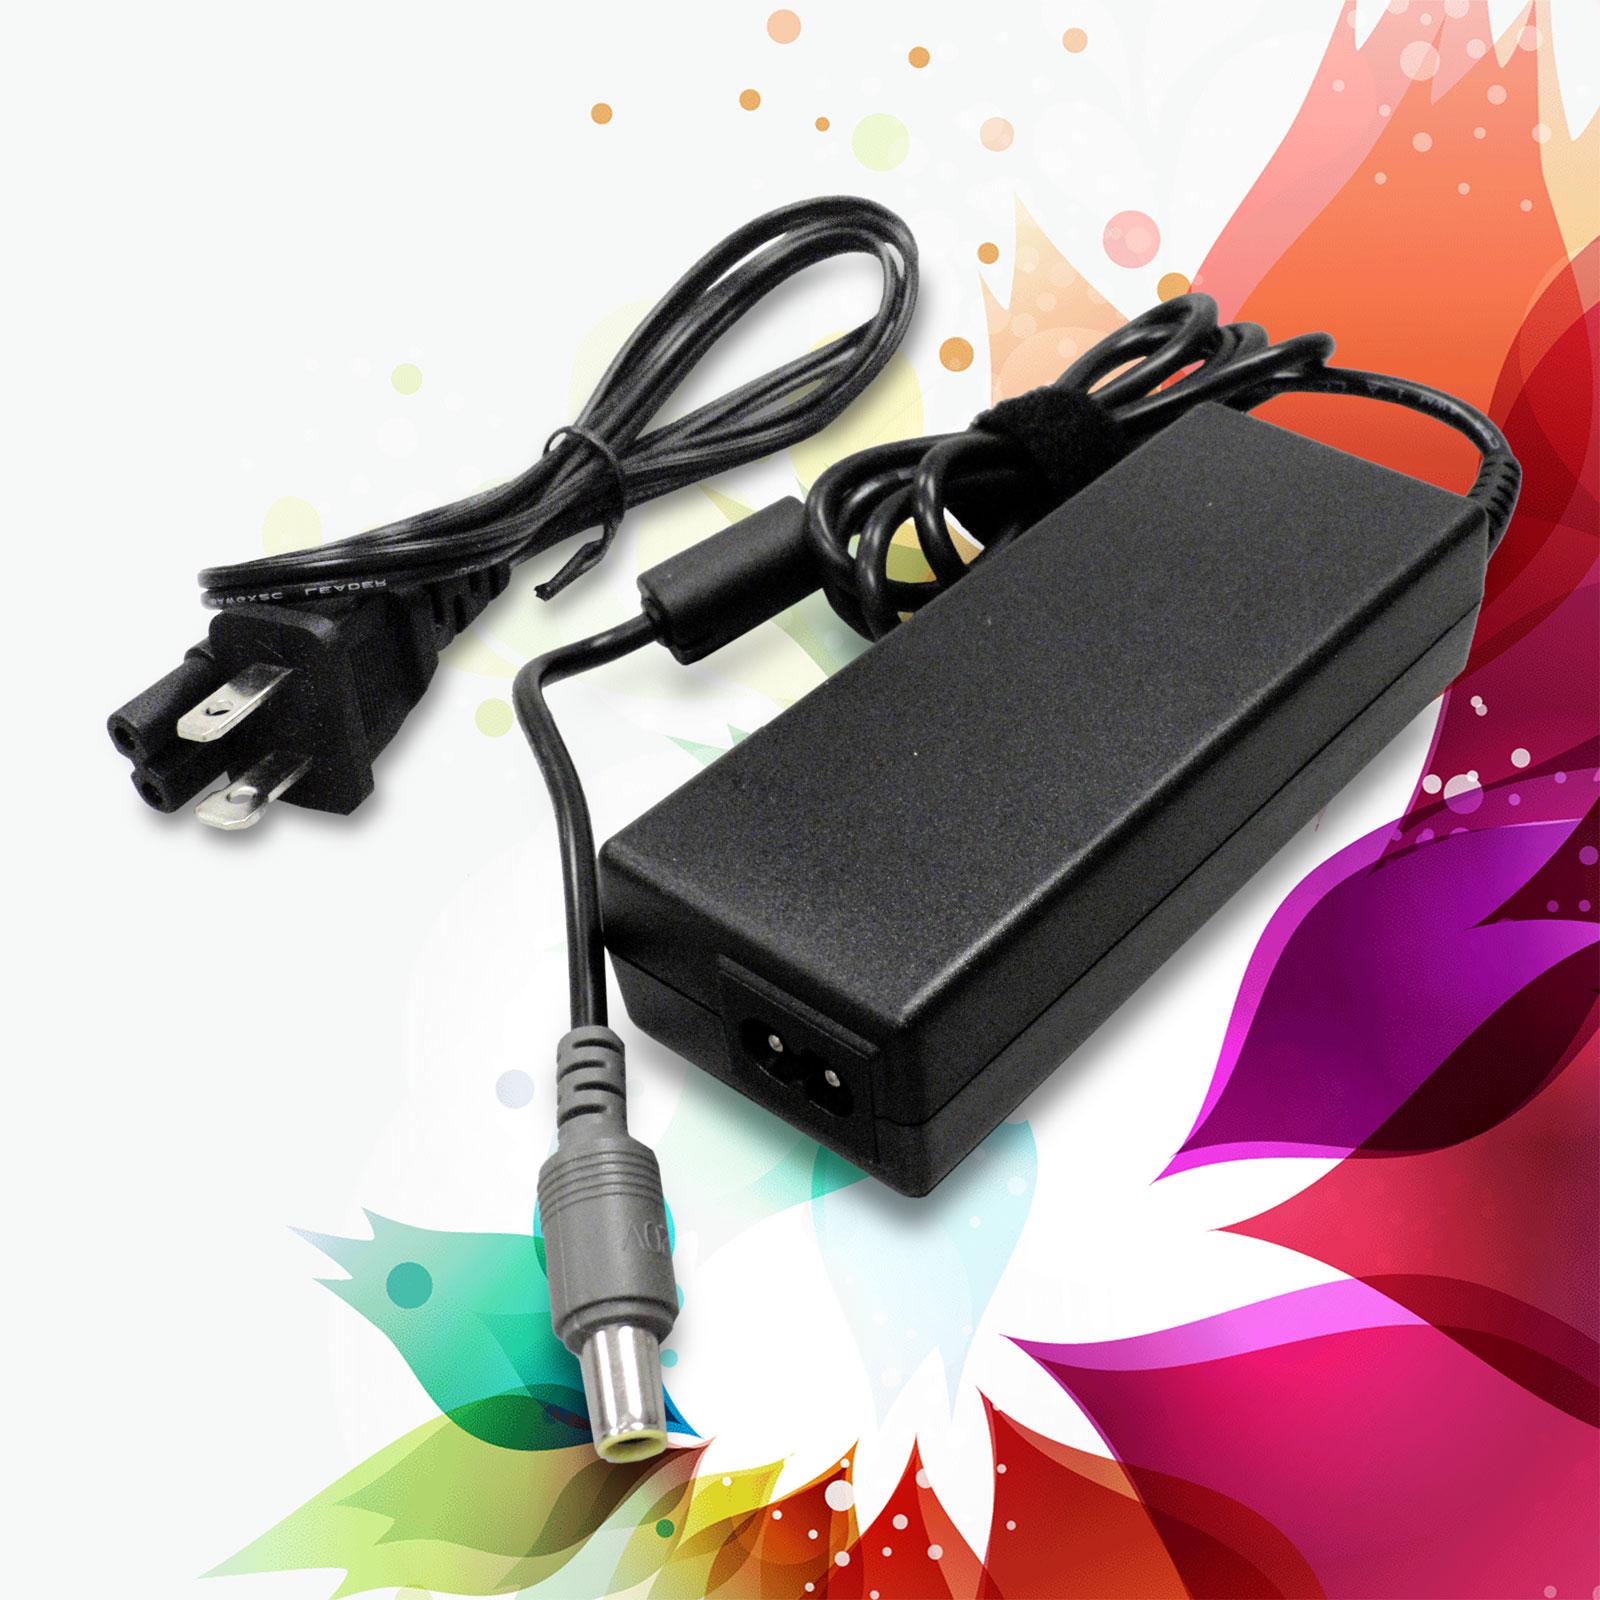 90W AC Power Battery Charger Supply Cord  Lenovo IBM Thinkpad X61 T61 T61P R60